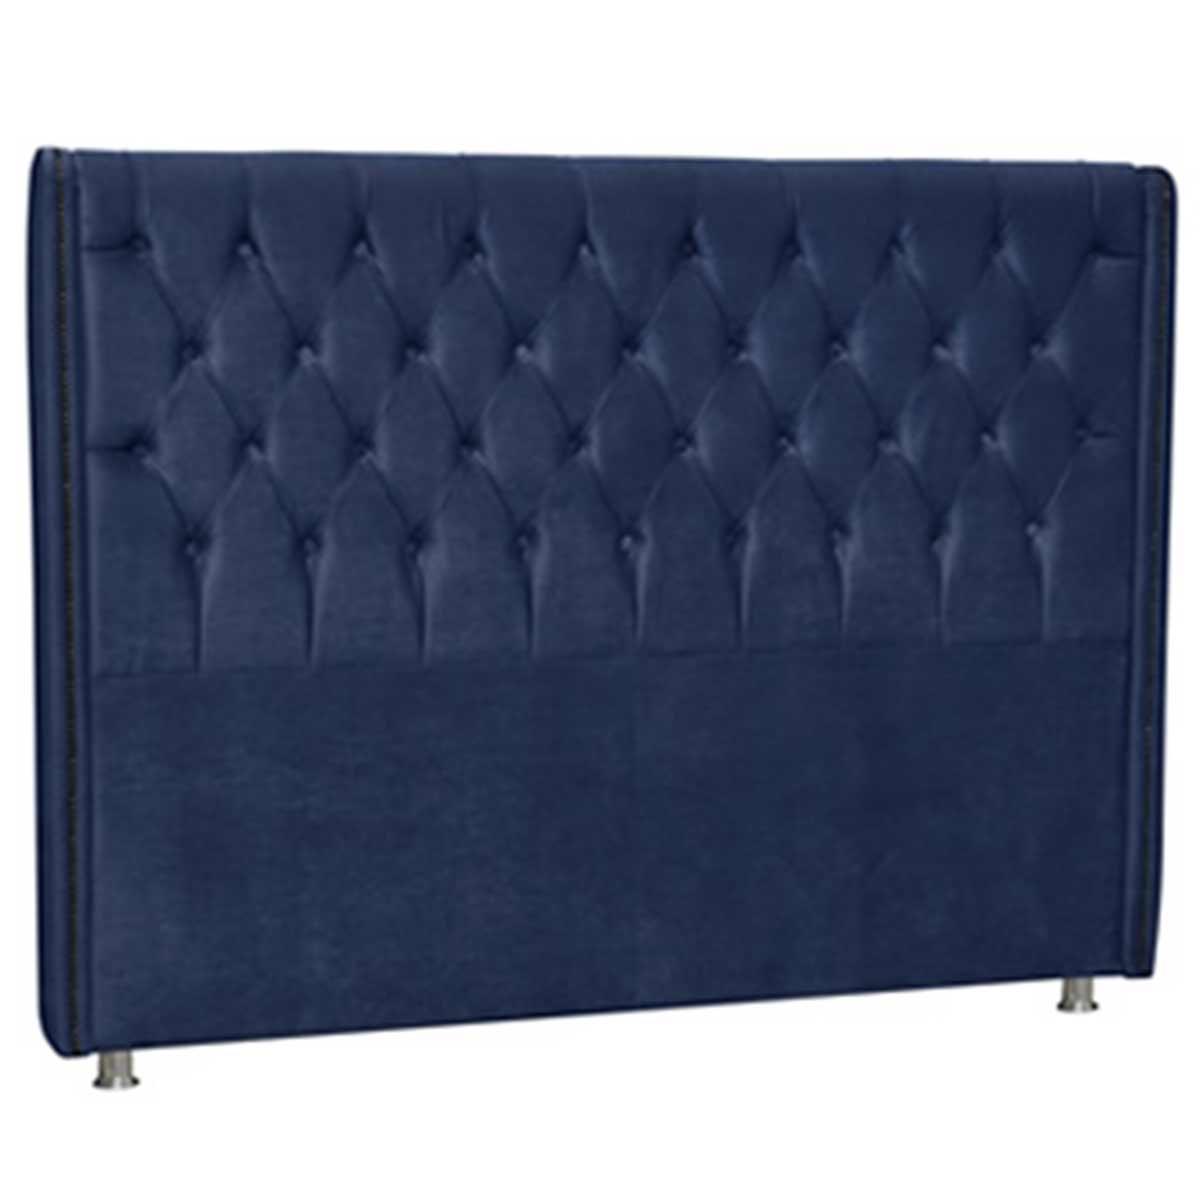 Cabeceira Firenze Solteiro 90 cm Azul Escuro Perfan Móveis